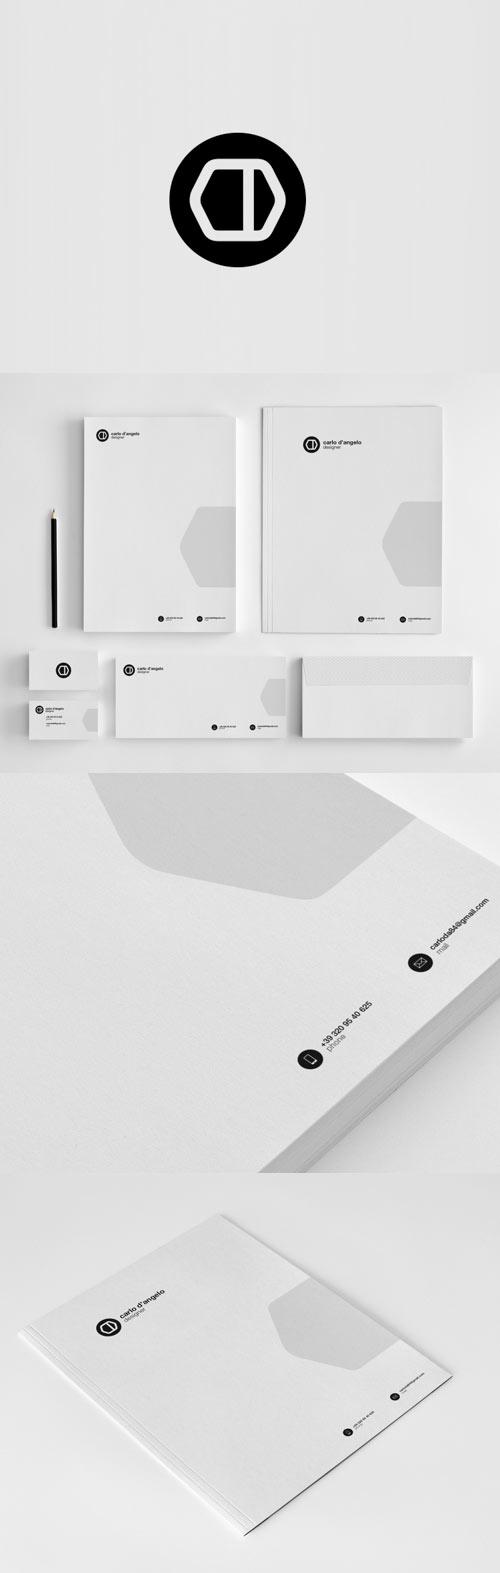 corporate_identity_design_3